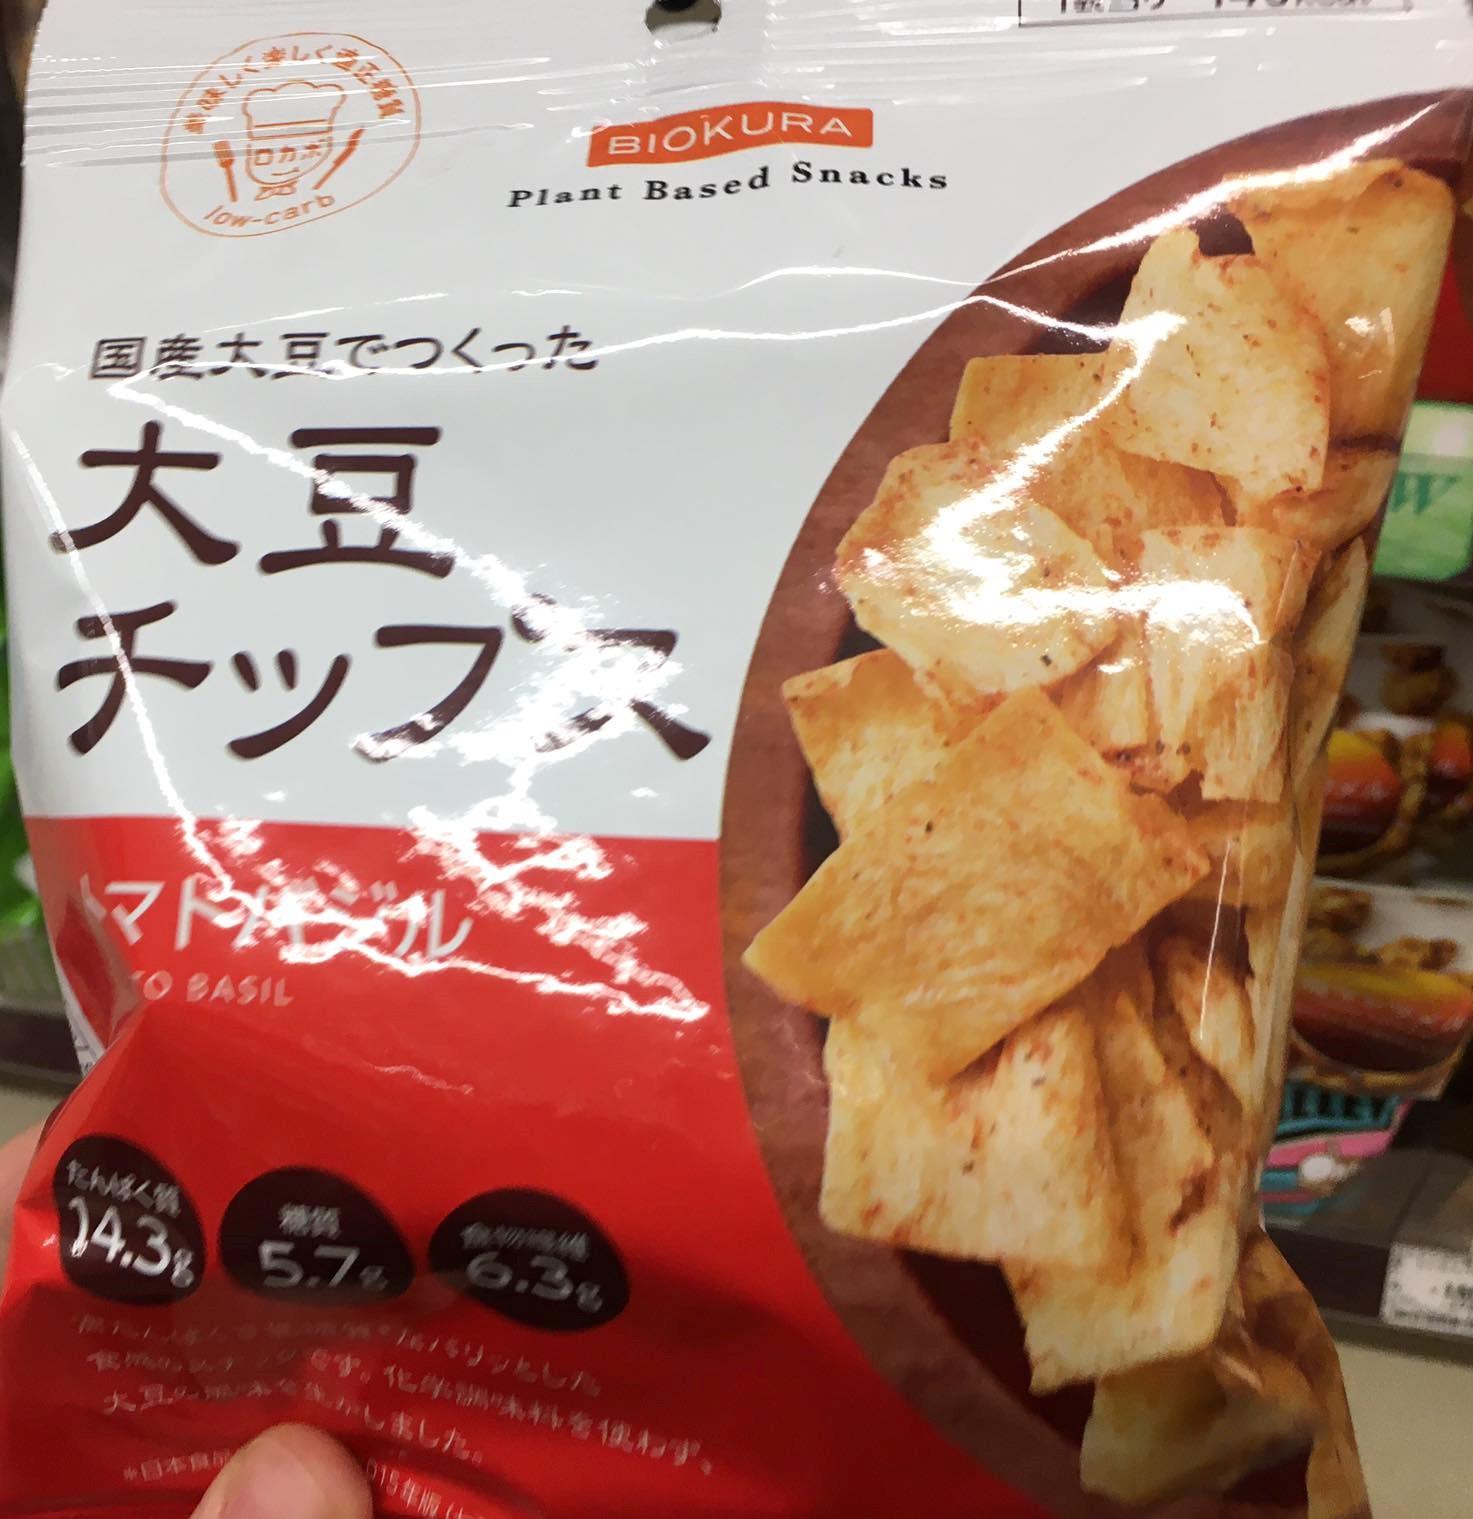 Biokura Soybean Chips Tomato Basil